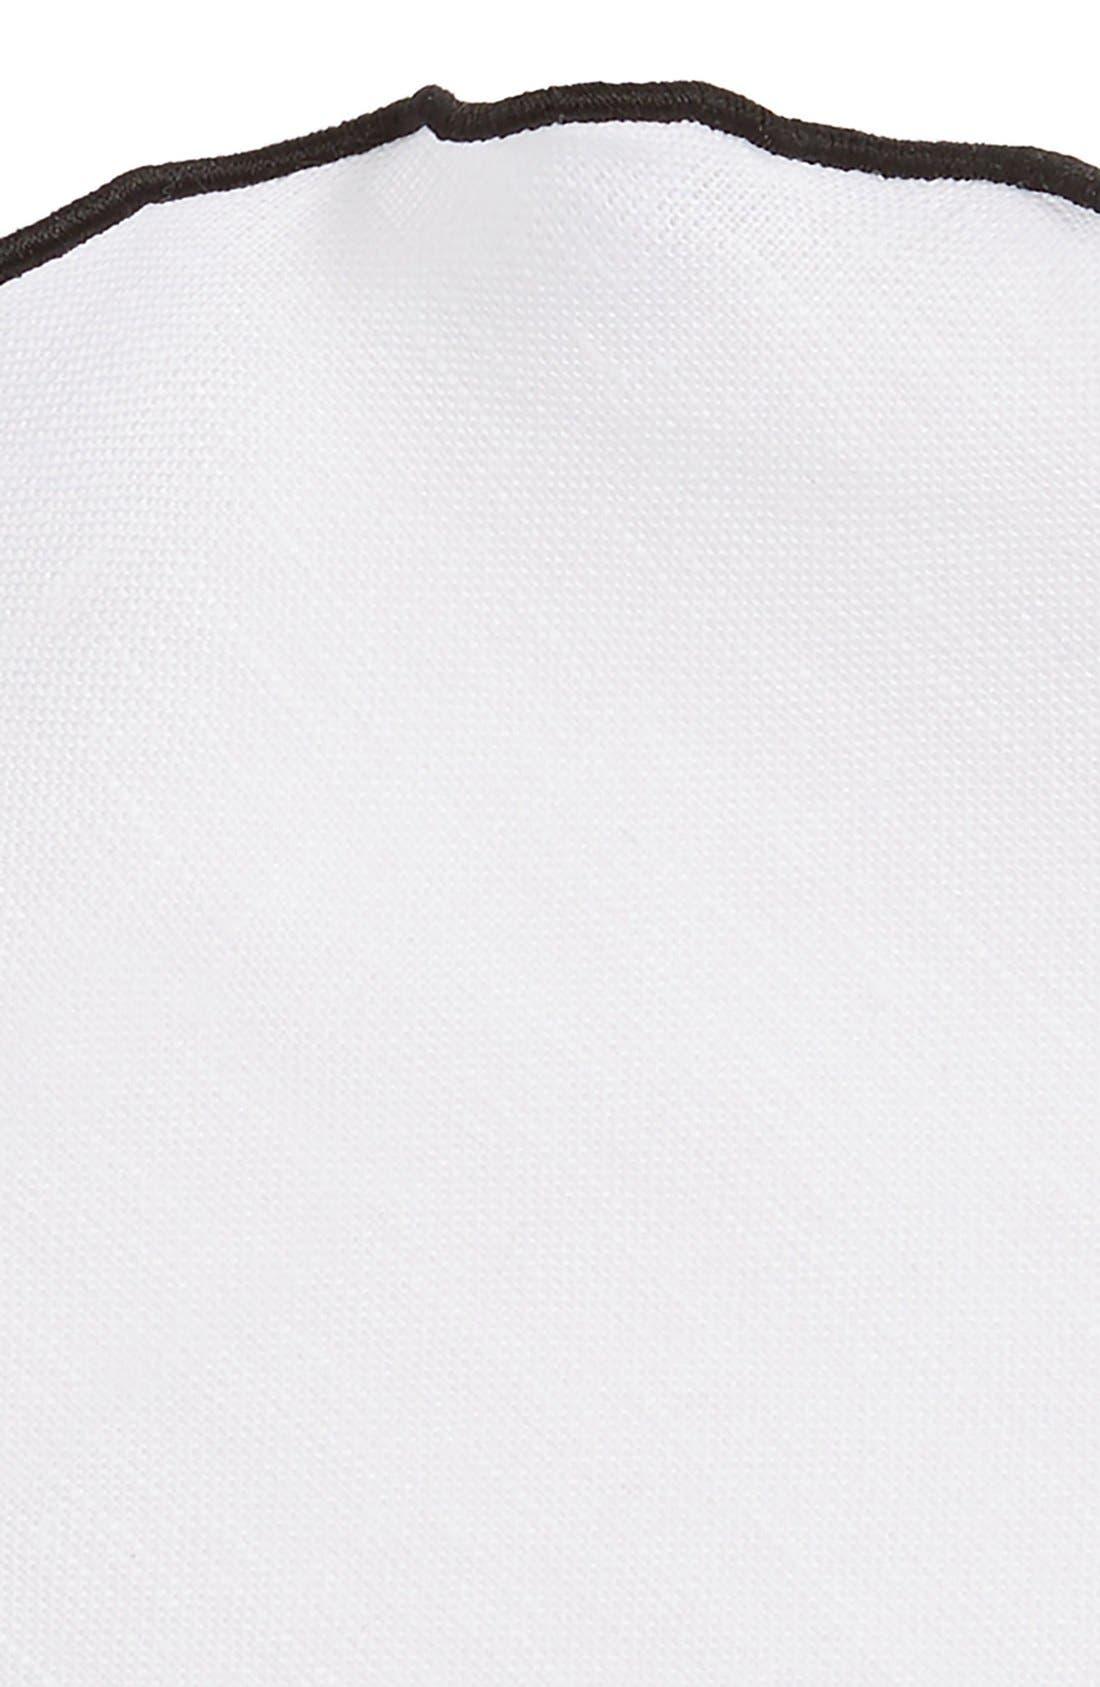 Linen Pocket Round,                             Alternate thumbnail 3, color,                             White/ Black Trim